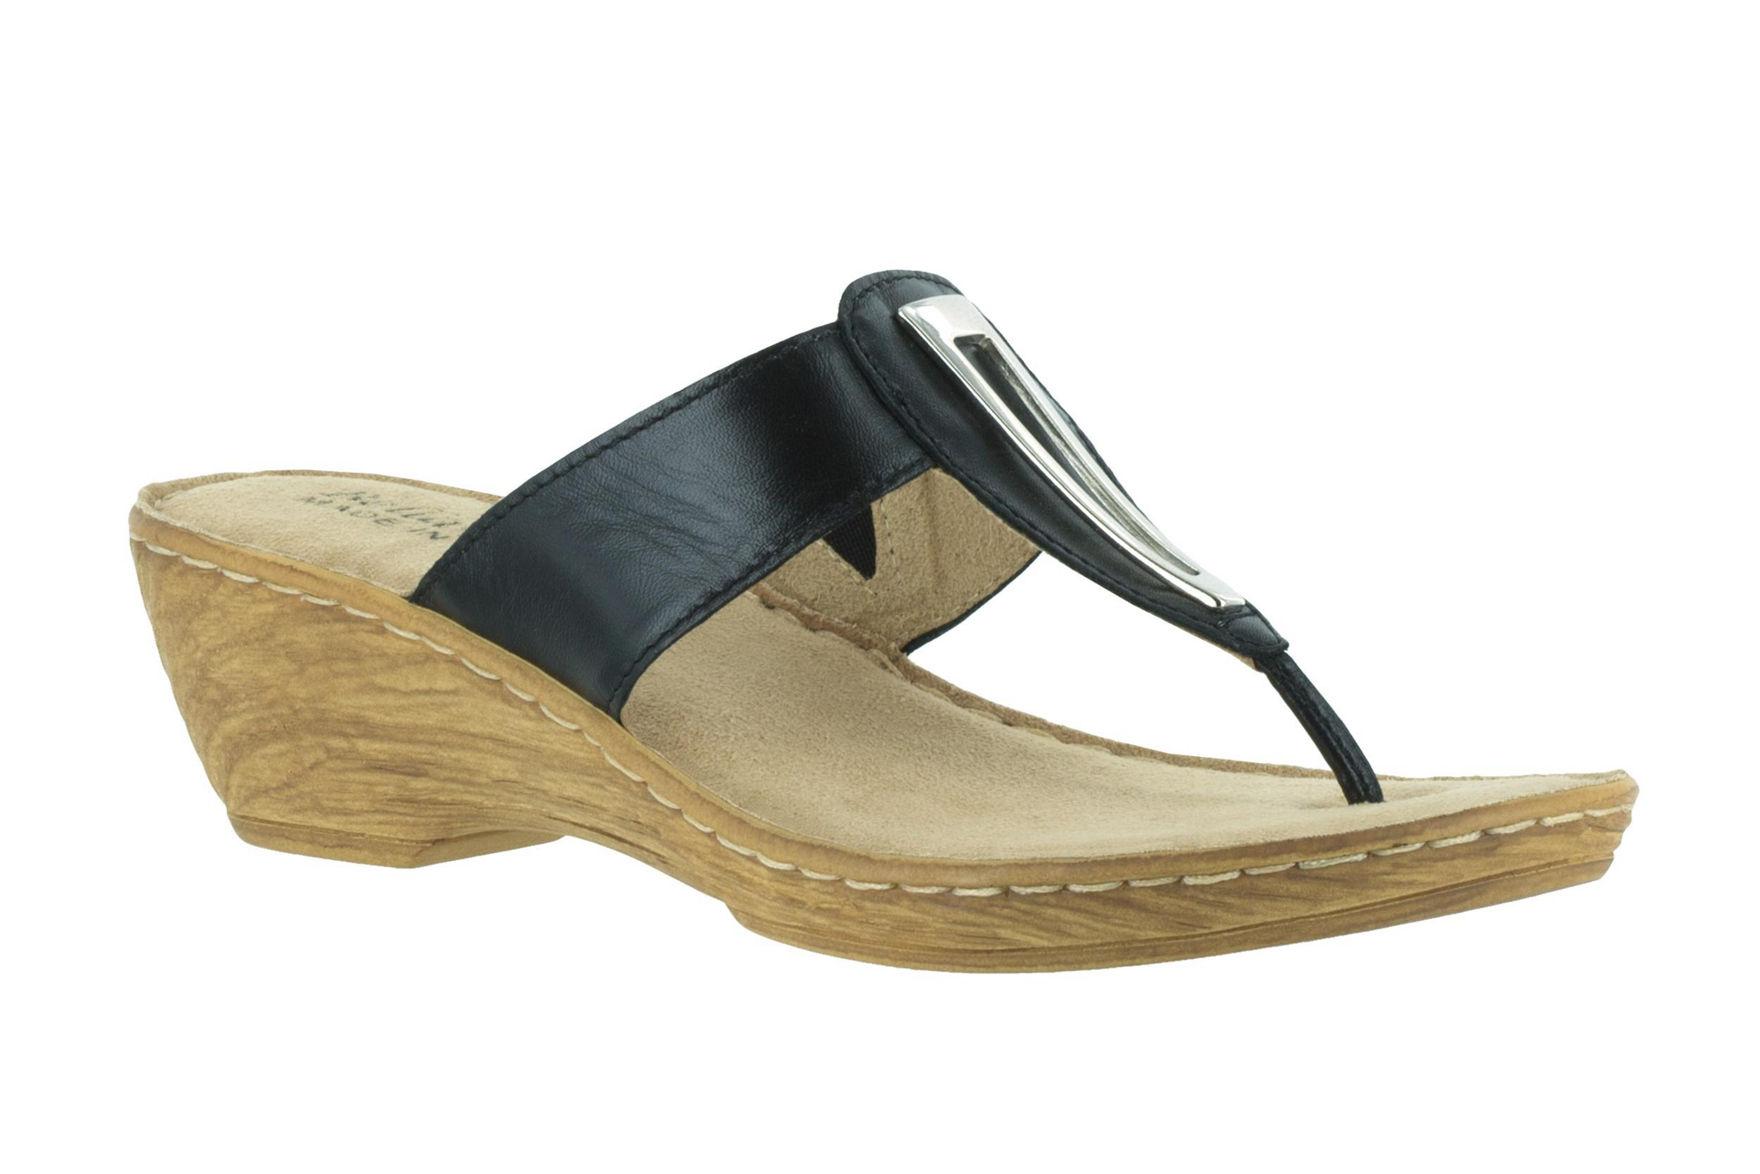 Bella Vita Black Flip Flops